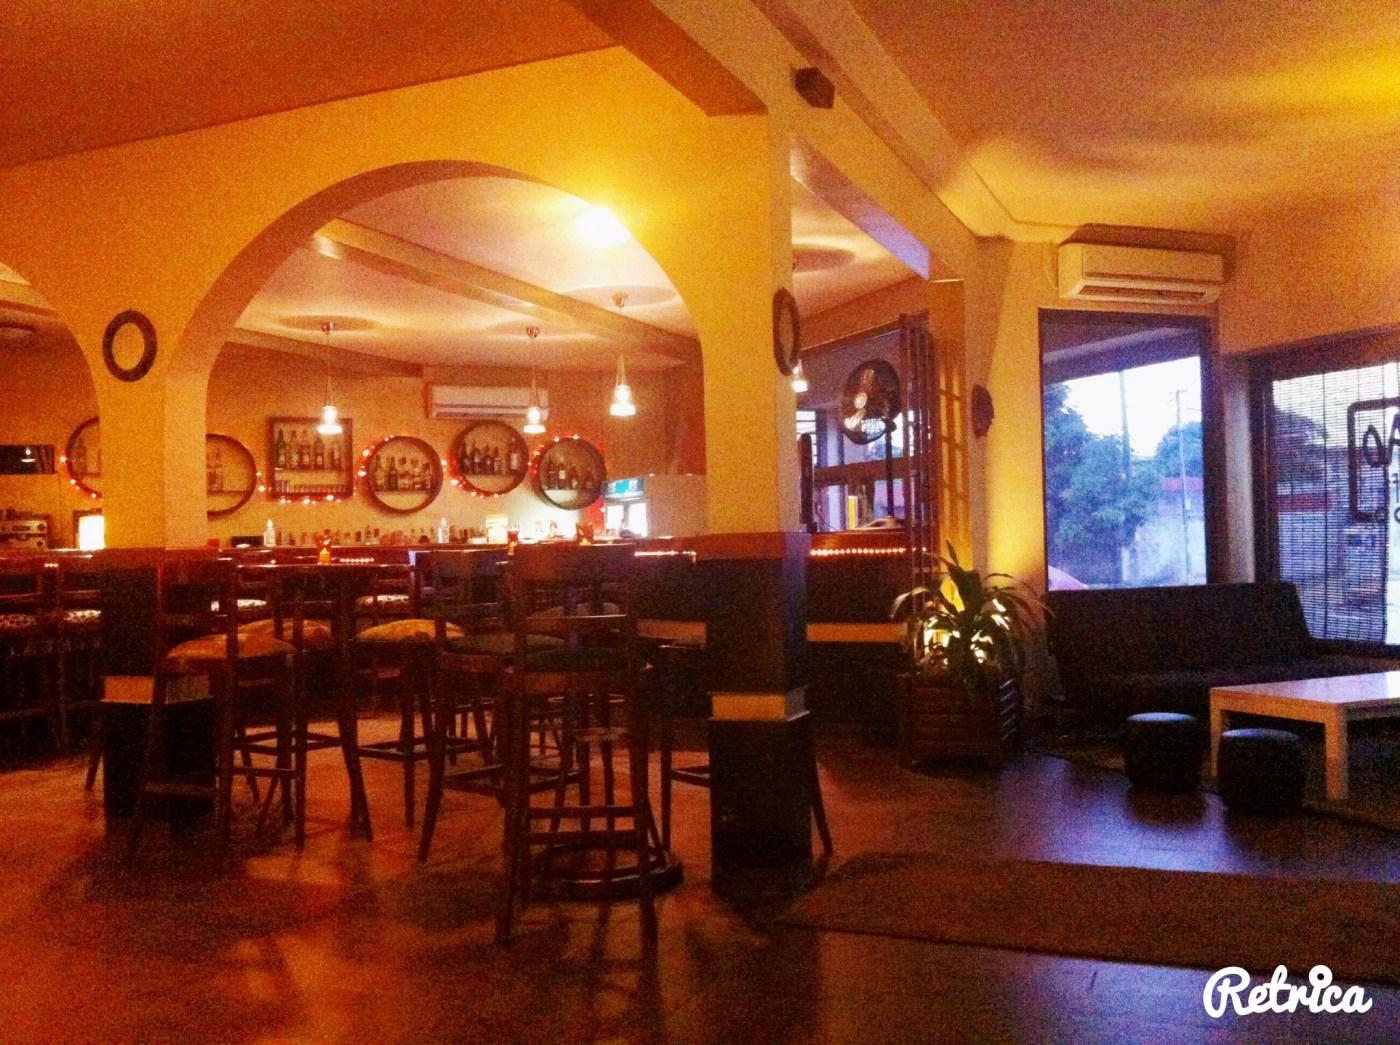 3 espaces de travail / restaurants, Bao Café, serialfoodie, Abidjan